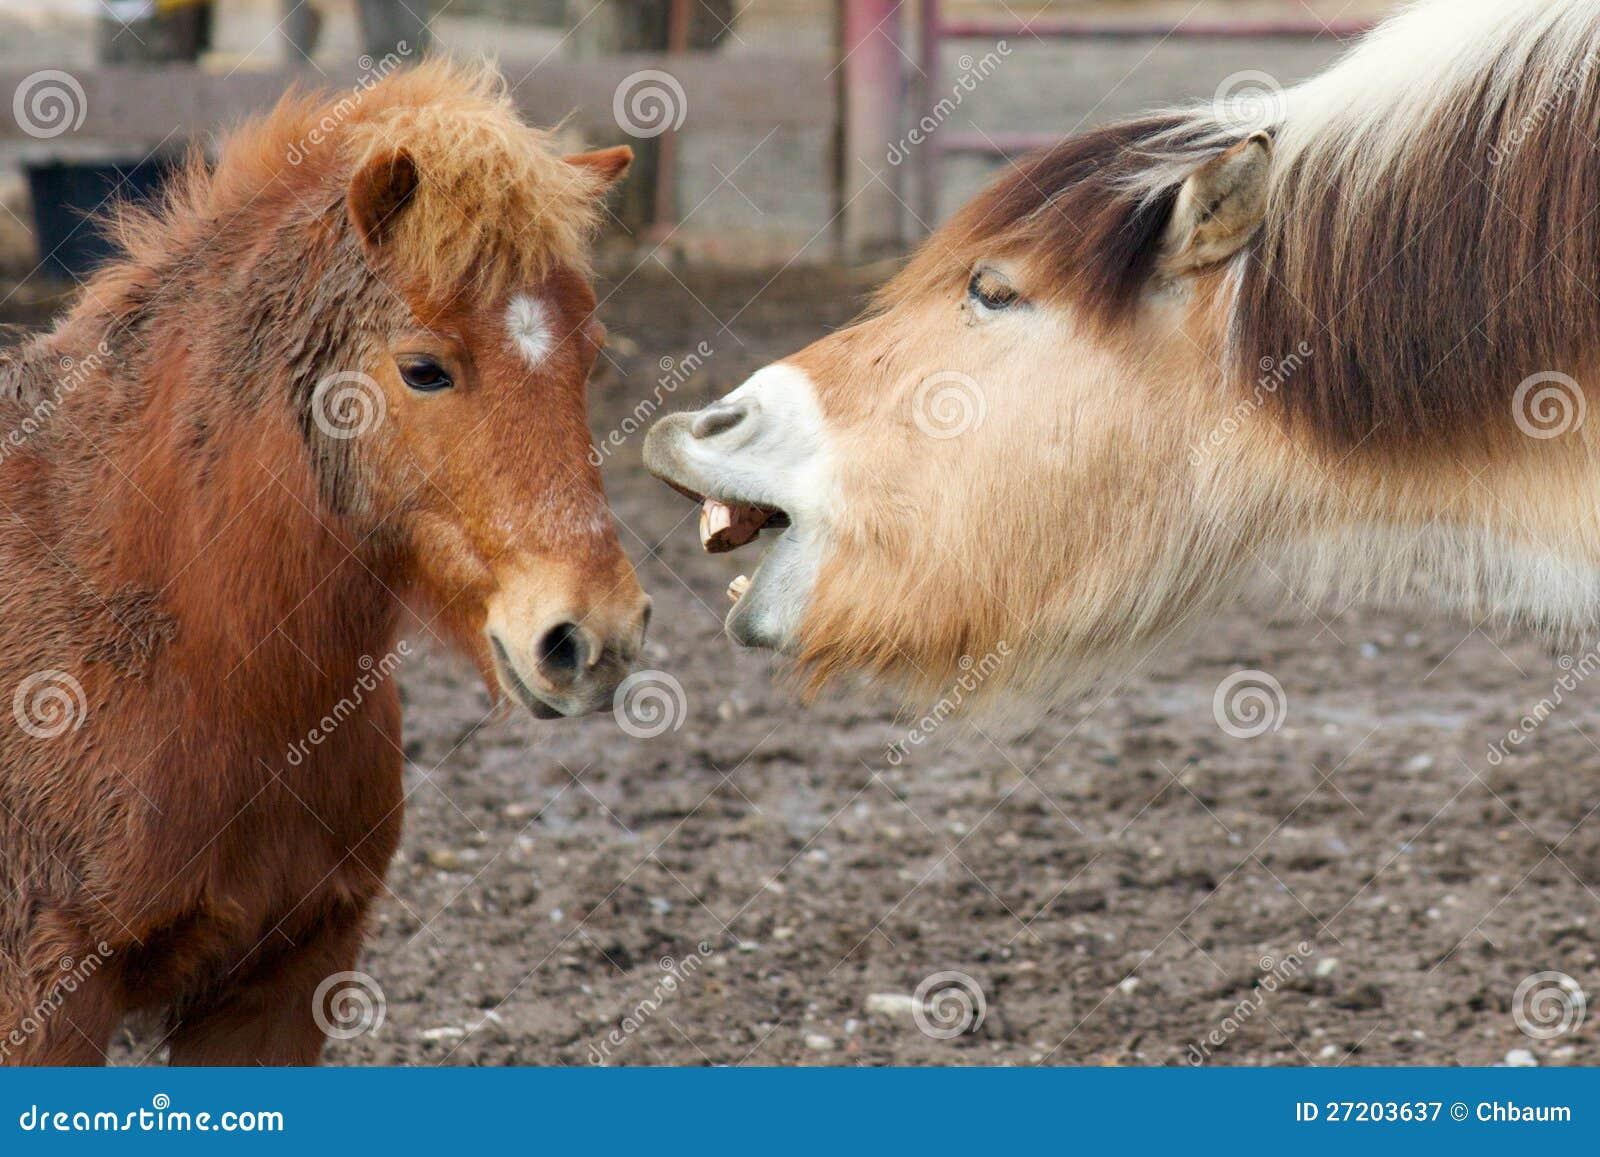 Horses Talking Royalty Free Stock Photography